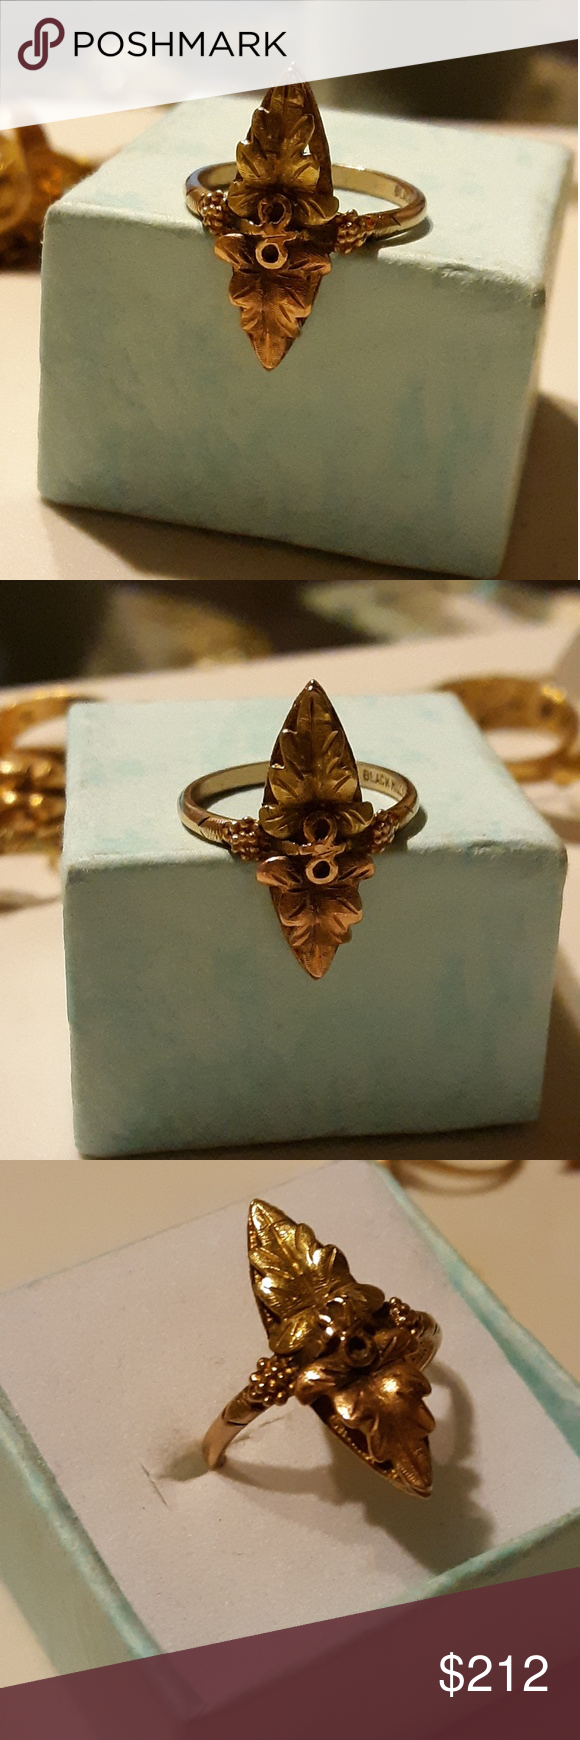 Ladies Black Hills Multi Tone 10k Gold Ring Size 6 Black Hills Gold Jewelry 10k Gold Ring Ring Size